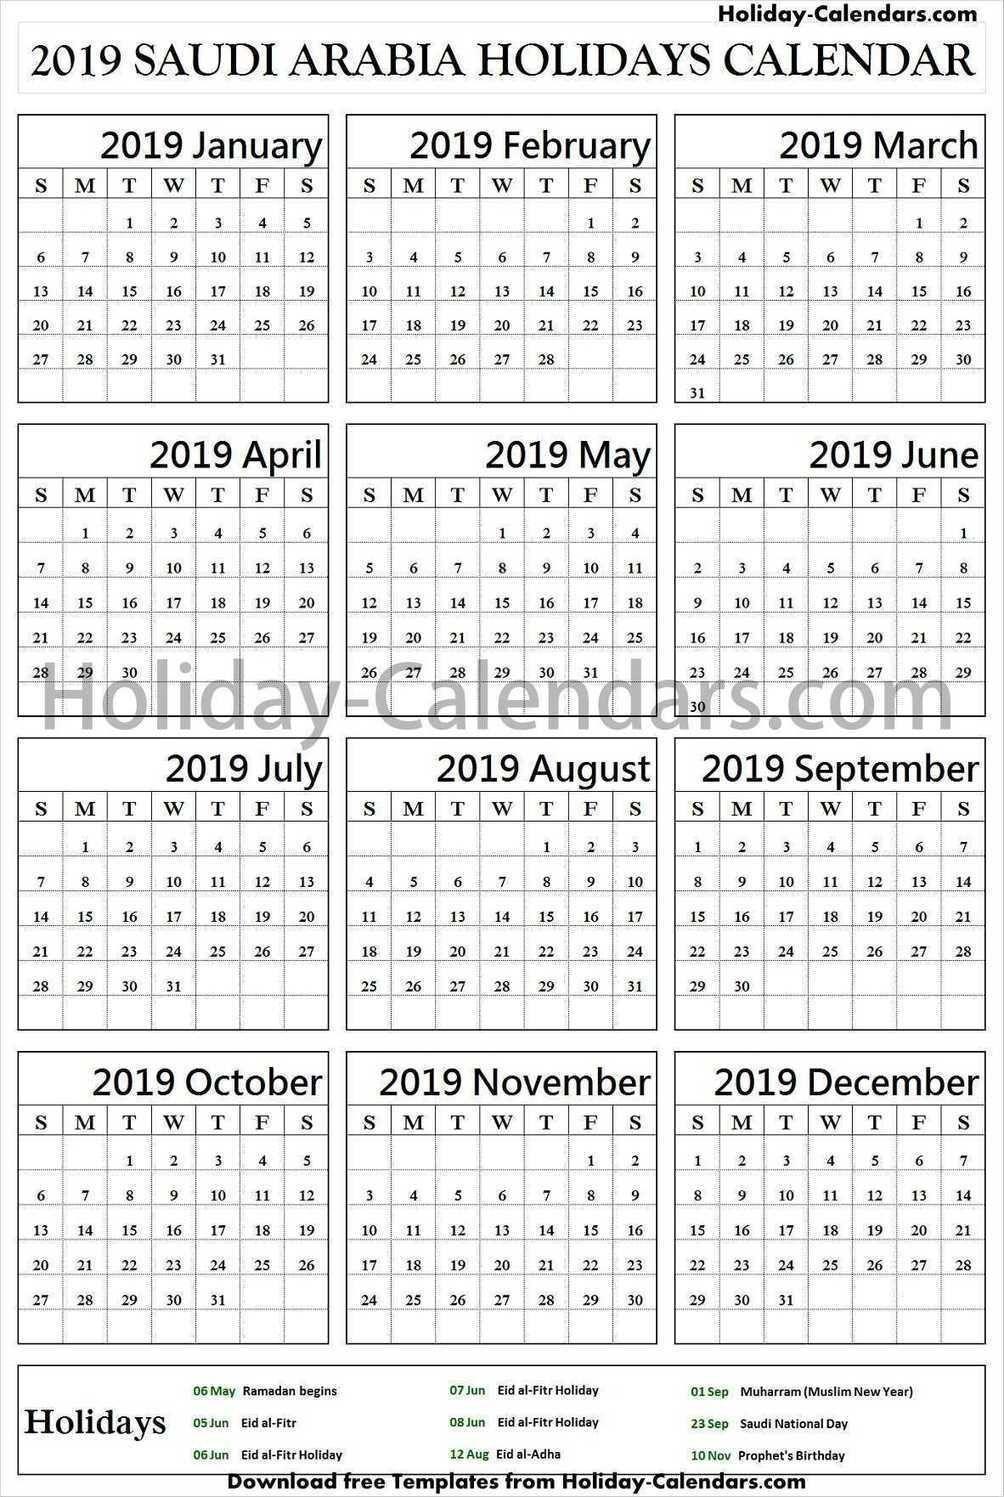 Saudi Arabia Bank Holidays 2019 School Holidays Holiday